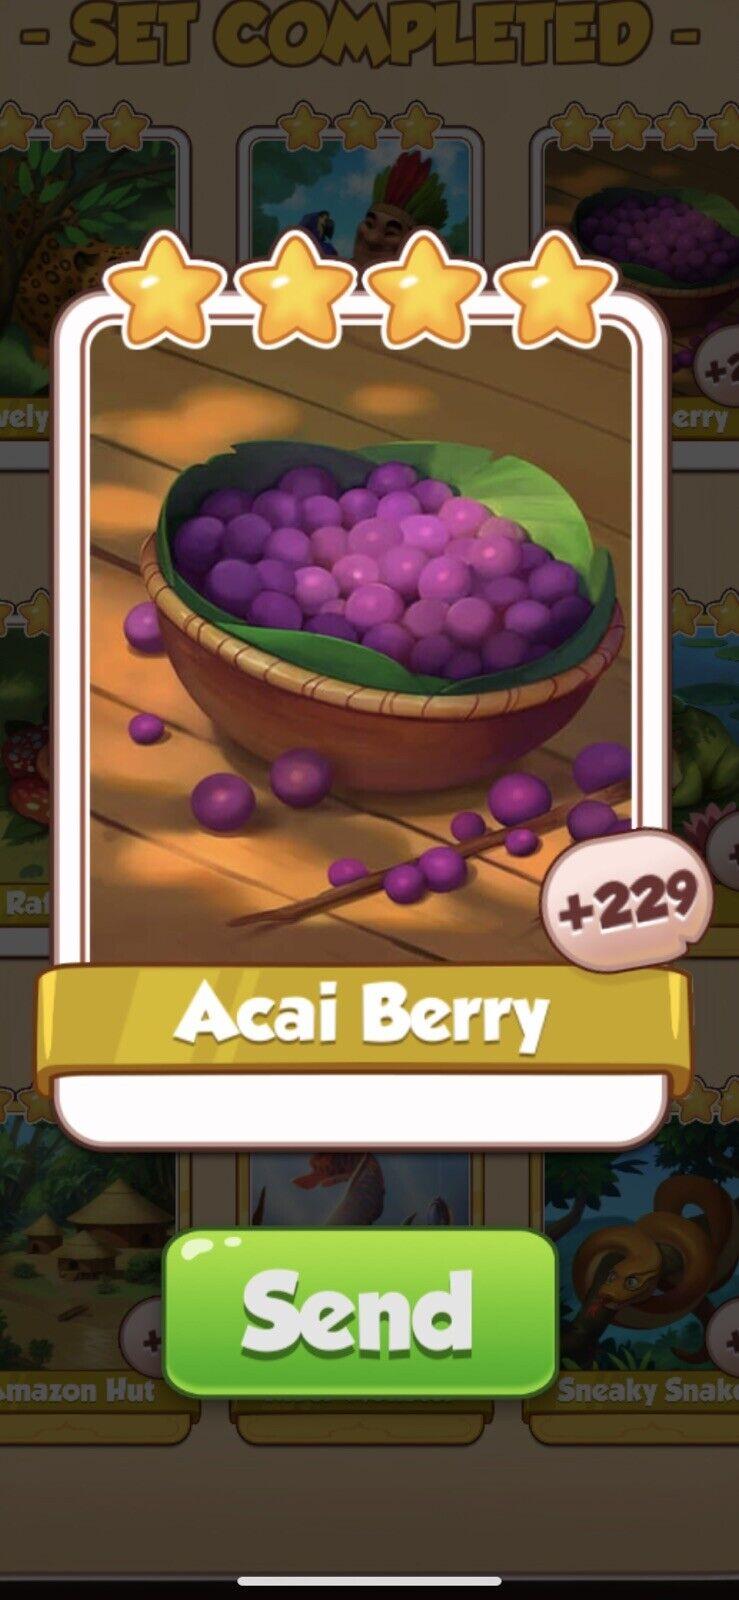 Coin Master Amazonas, Acai Berry Card (Fast Sending)